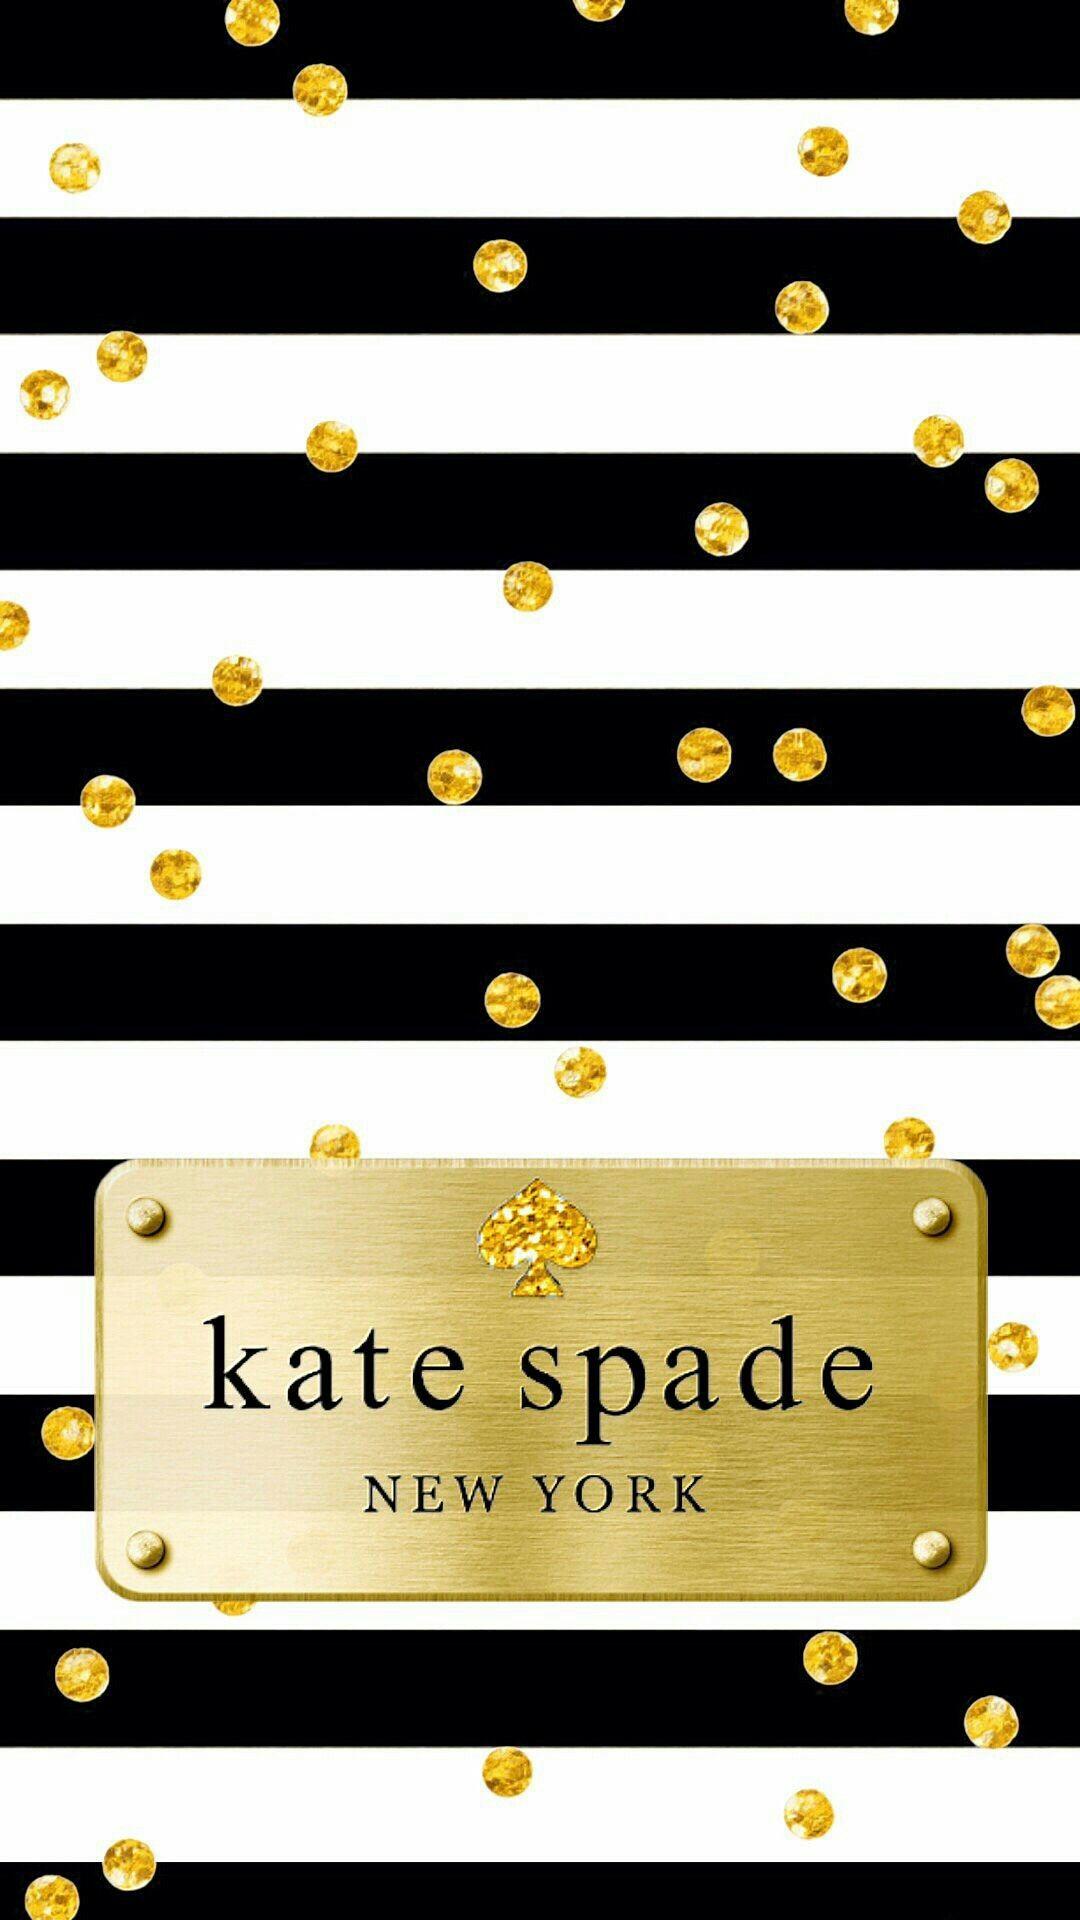 Icandy Iphone Wallpaper Kate Spade Kate Spade Wallpaper Pink Wallpaper Iphone